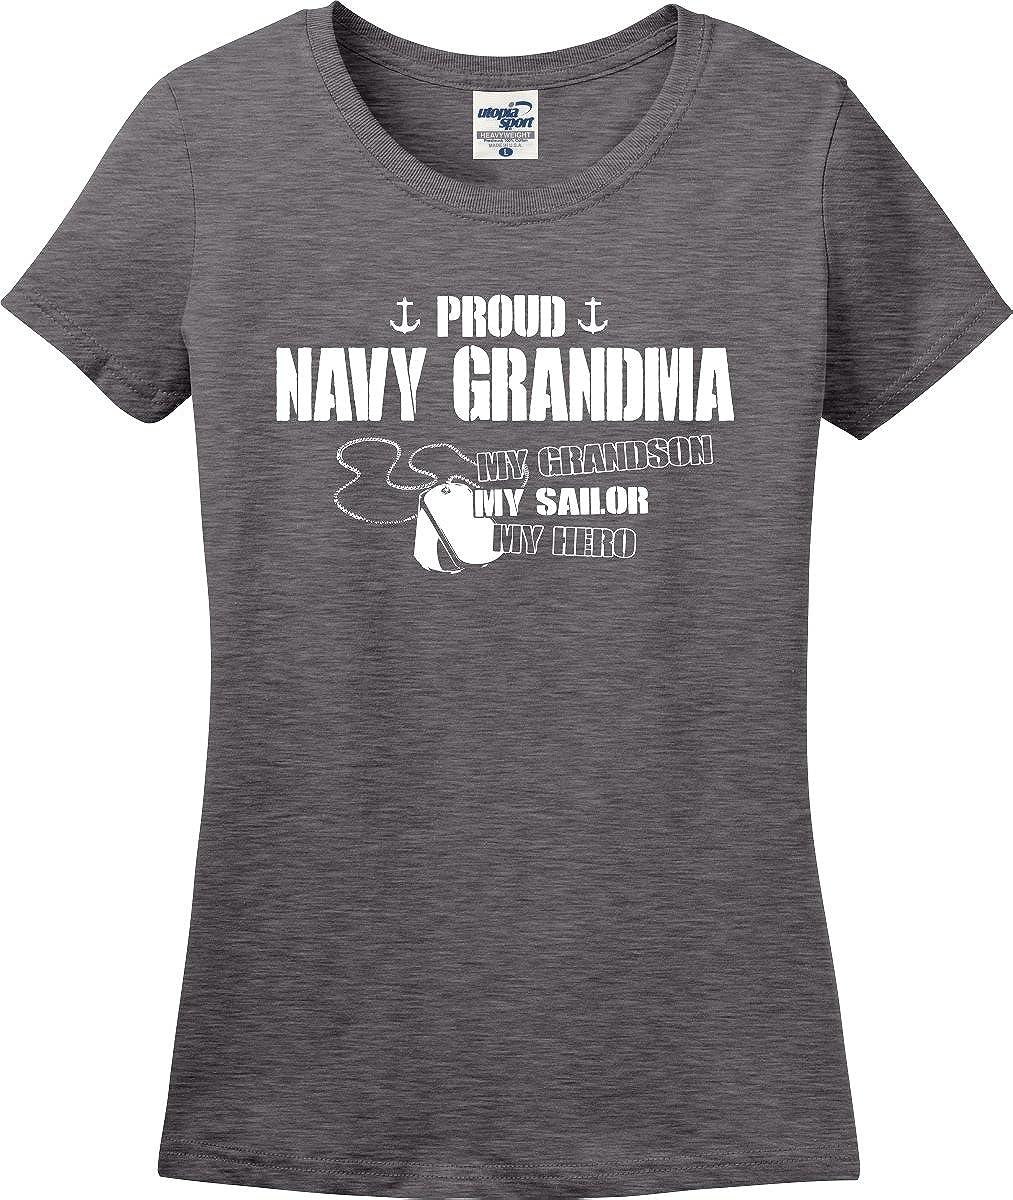 Utopia Sport Proud Navy Grandma My Grandson Sailor Hero Ladies T-Shirt (S-3X)